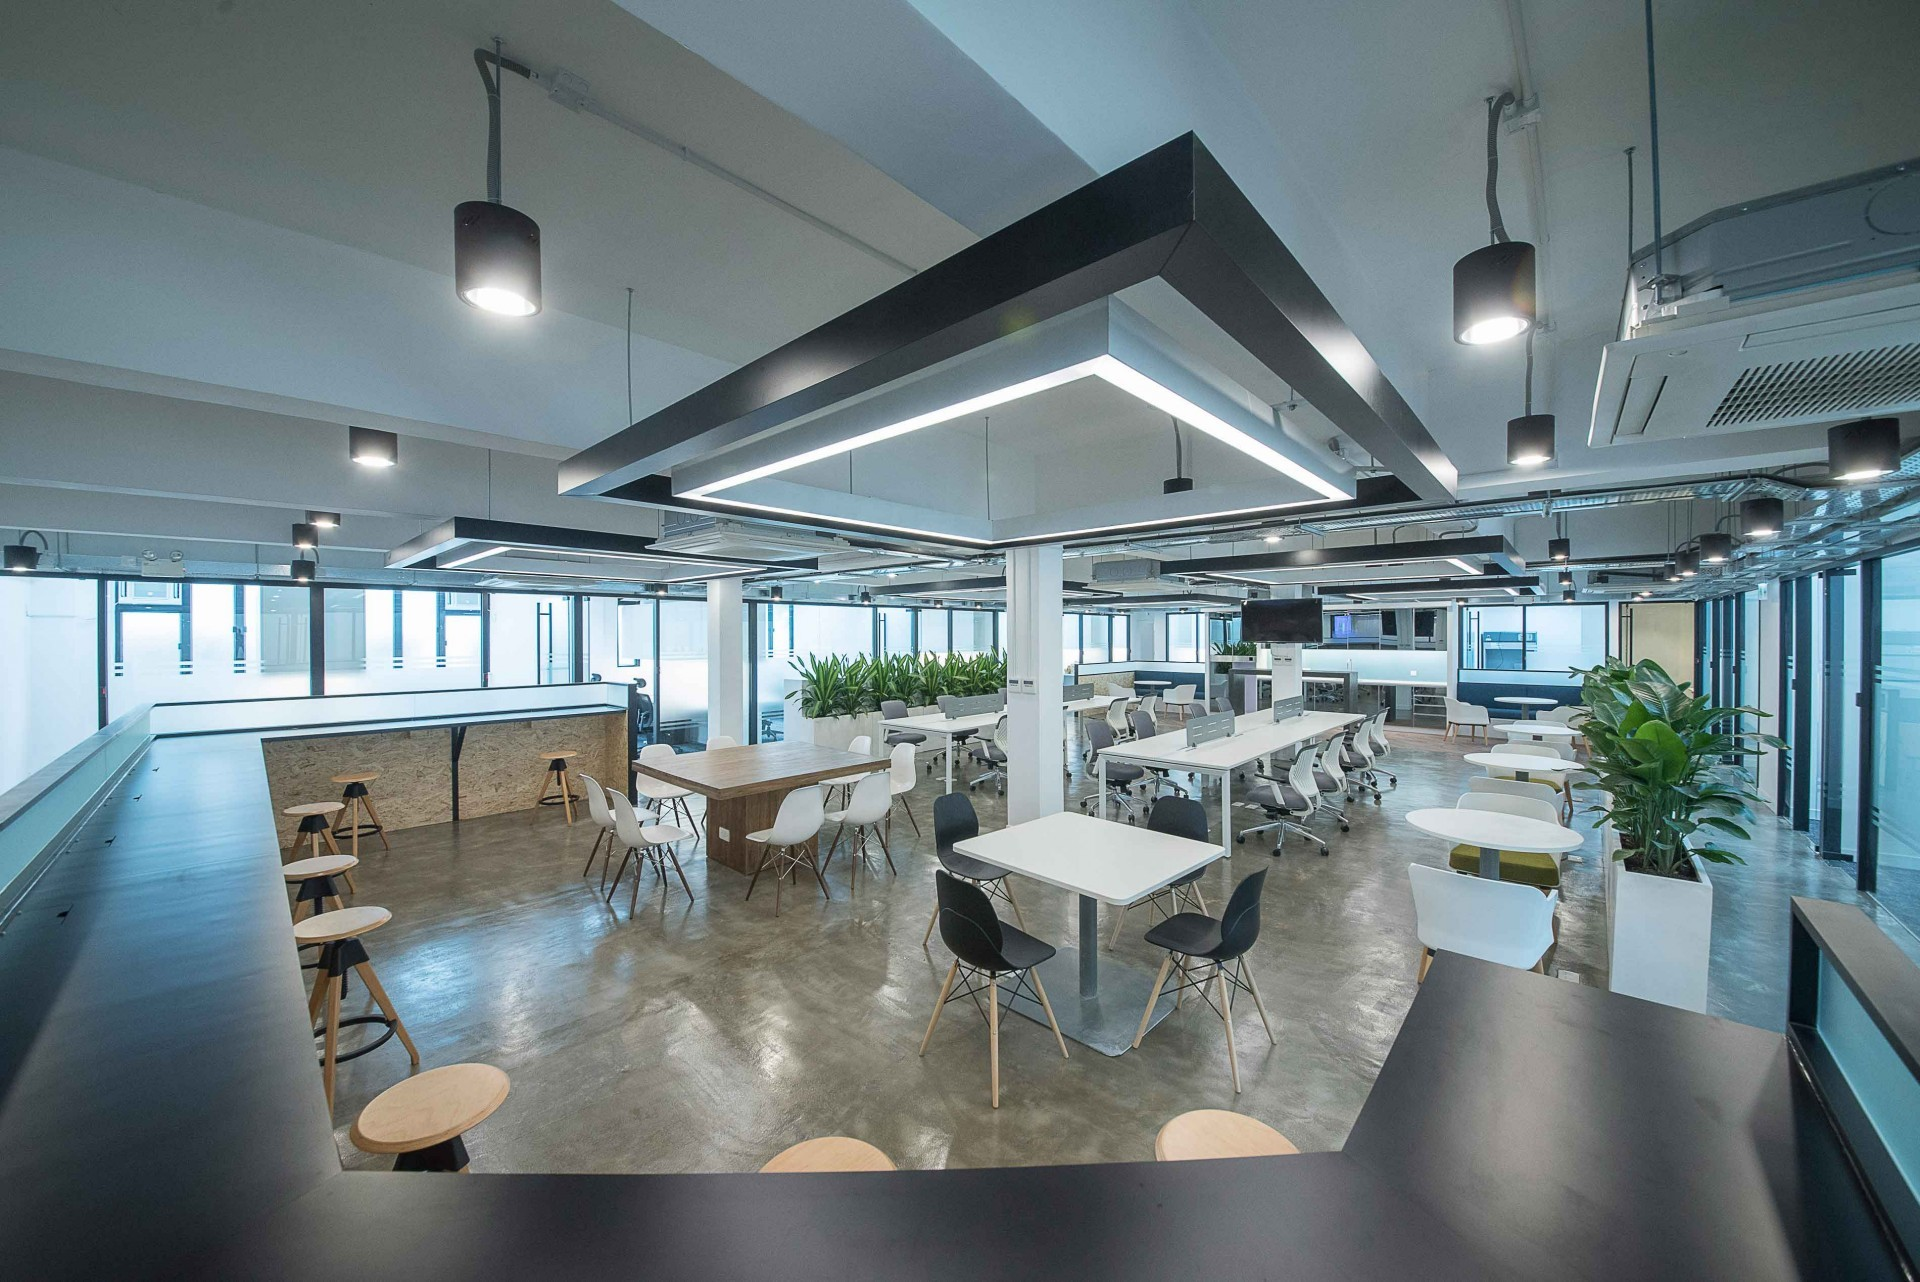 Ooosh coworking space